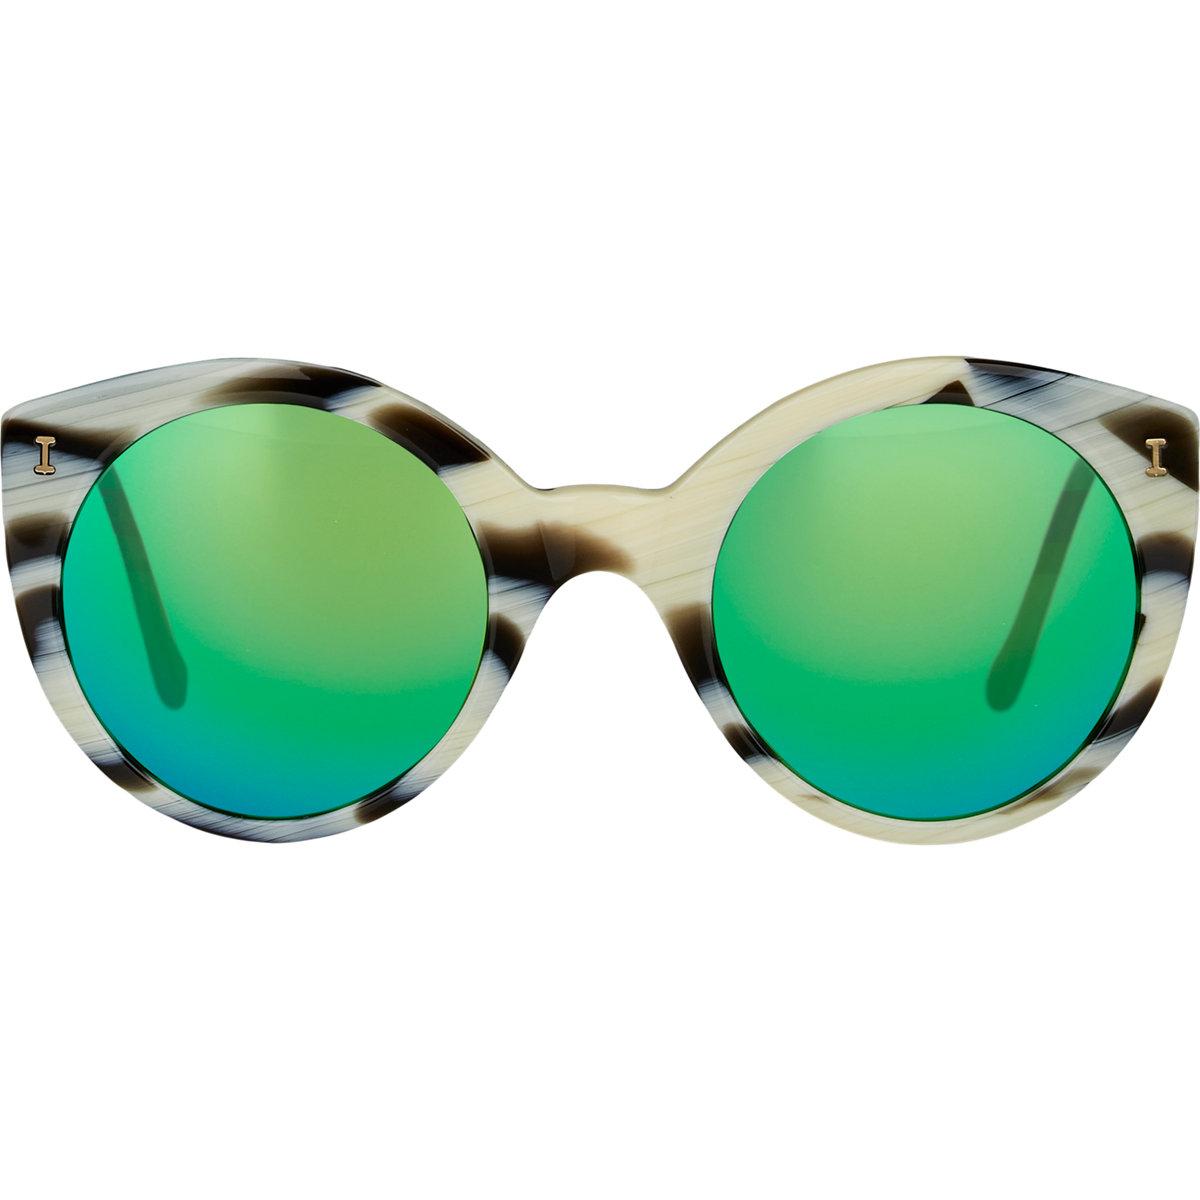 3234c35a3b Illesteva Palm Beach Sunglasses - Lyst